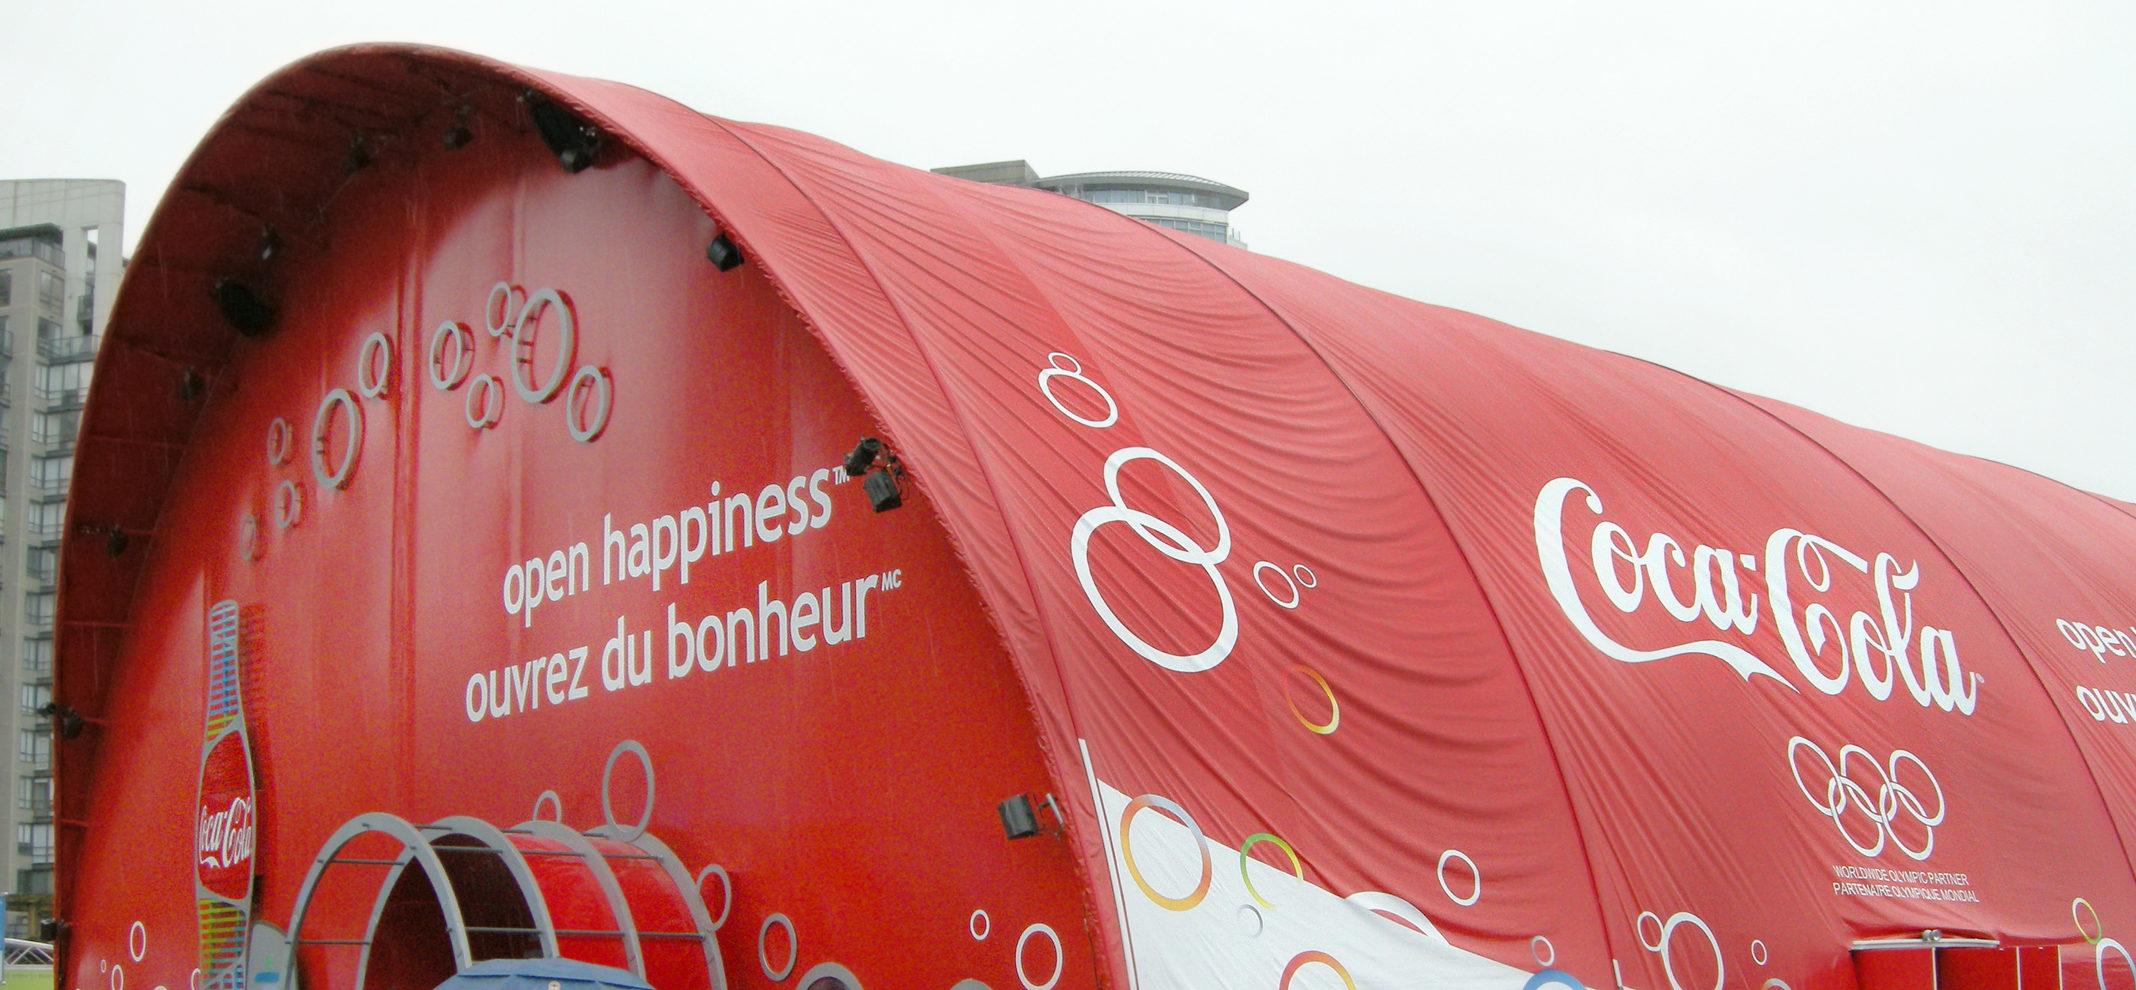 Coca Cola Vinyl Signs Vancouver 2010 Olympics Anchor Signs